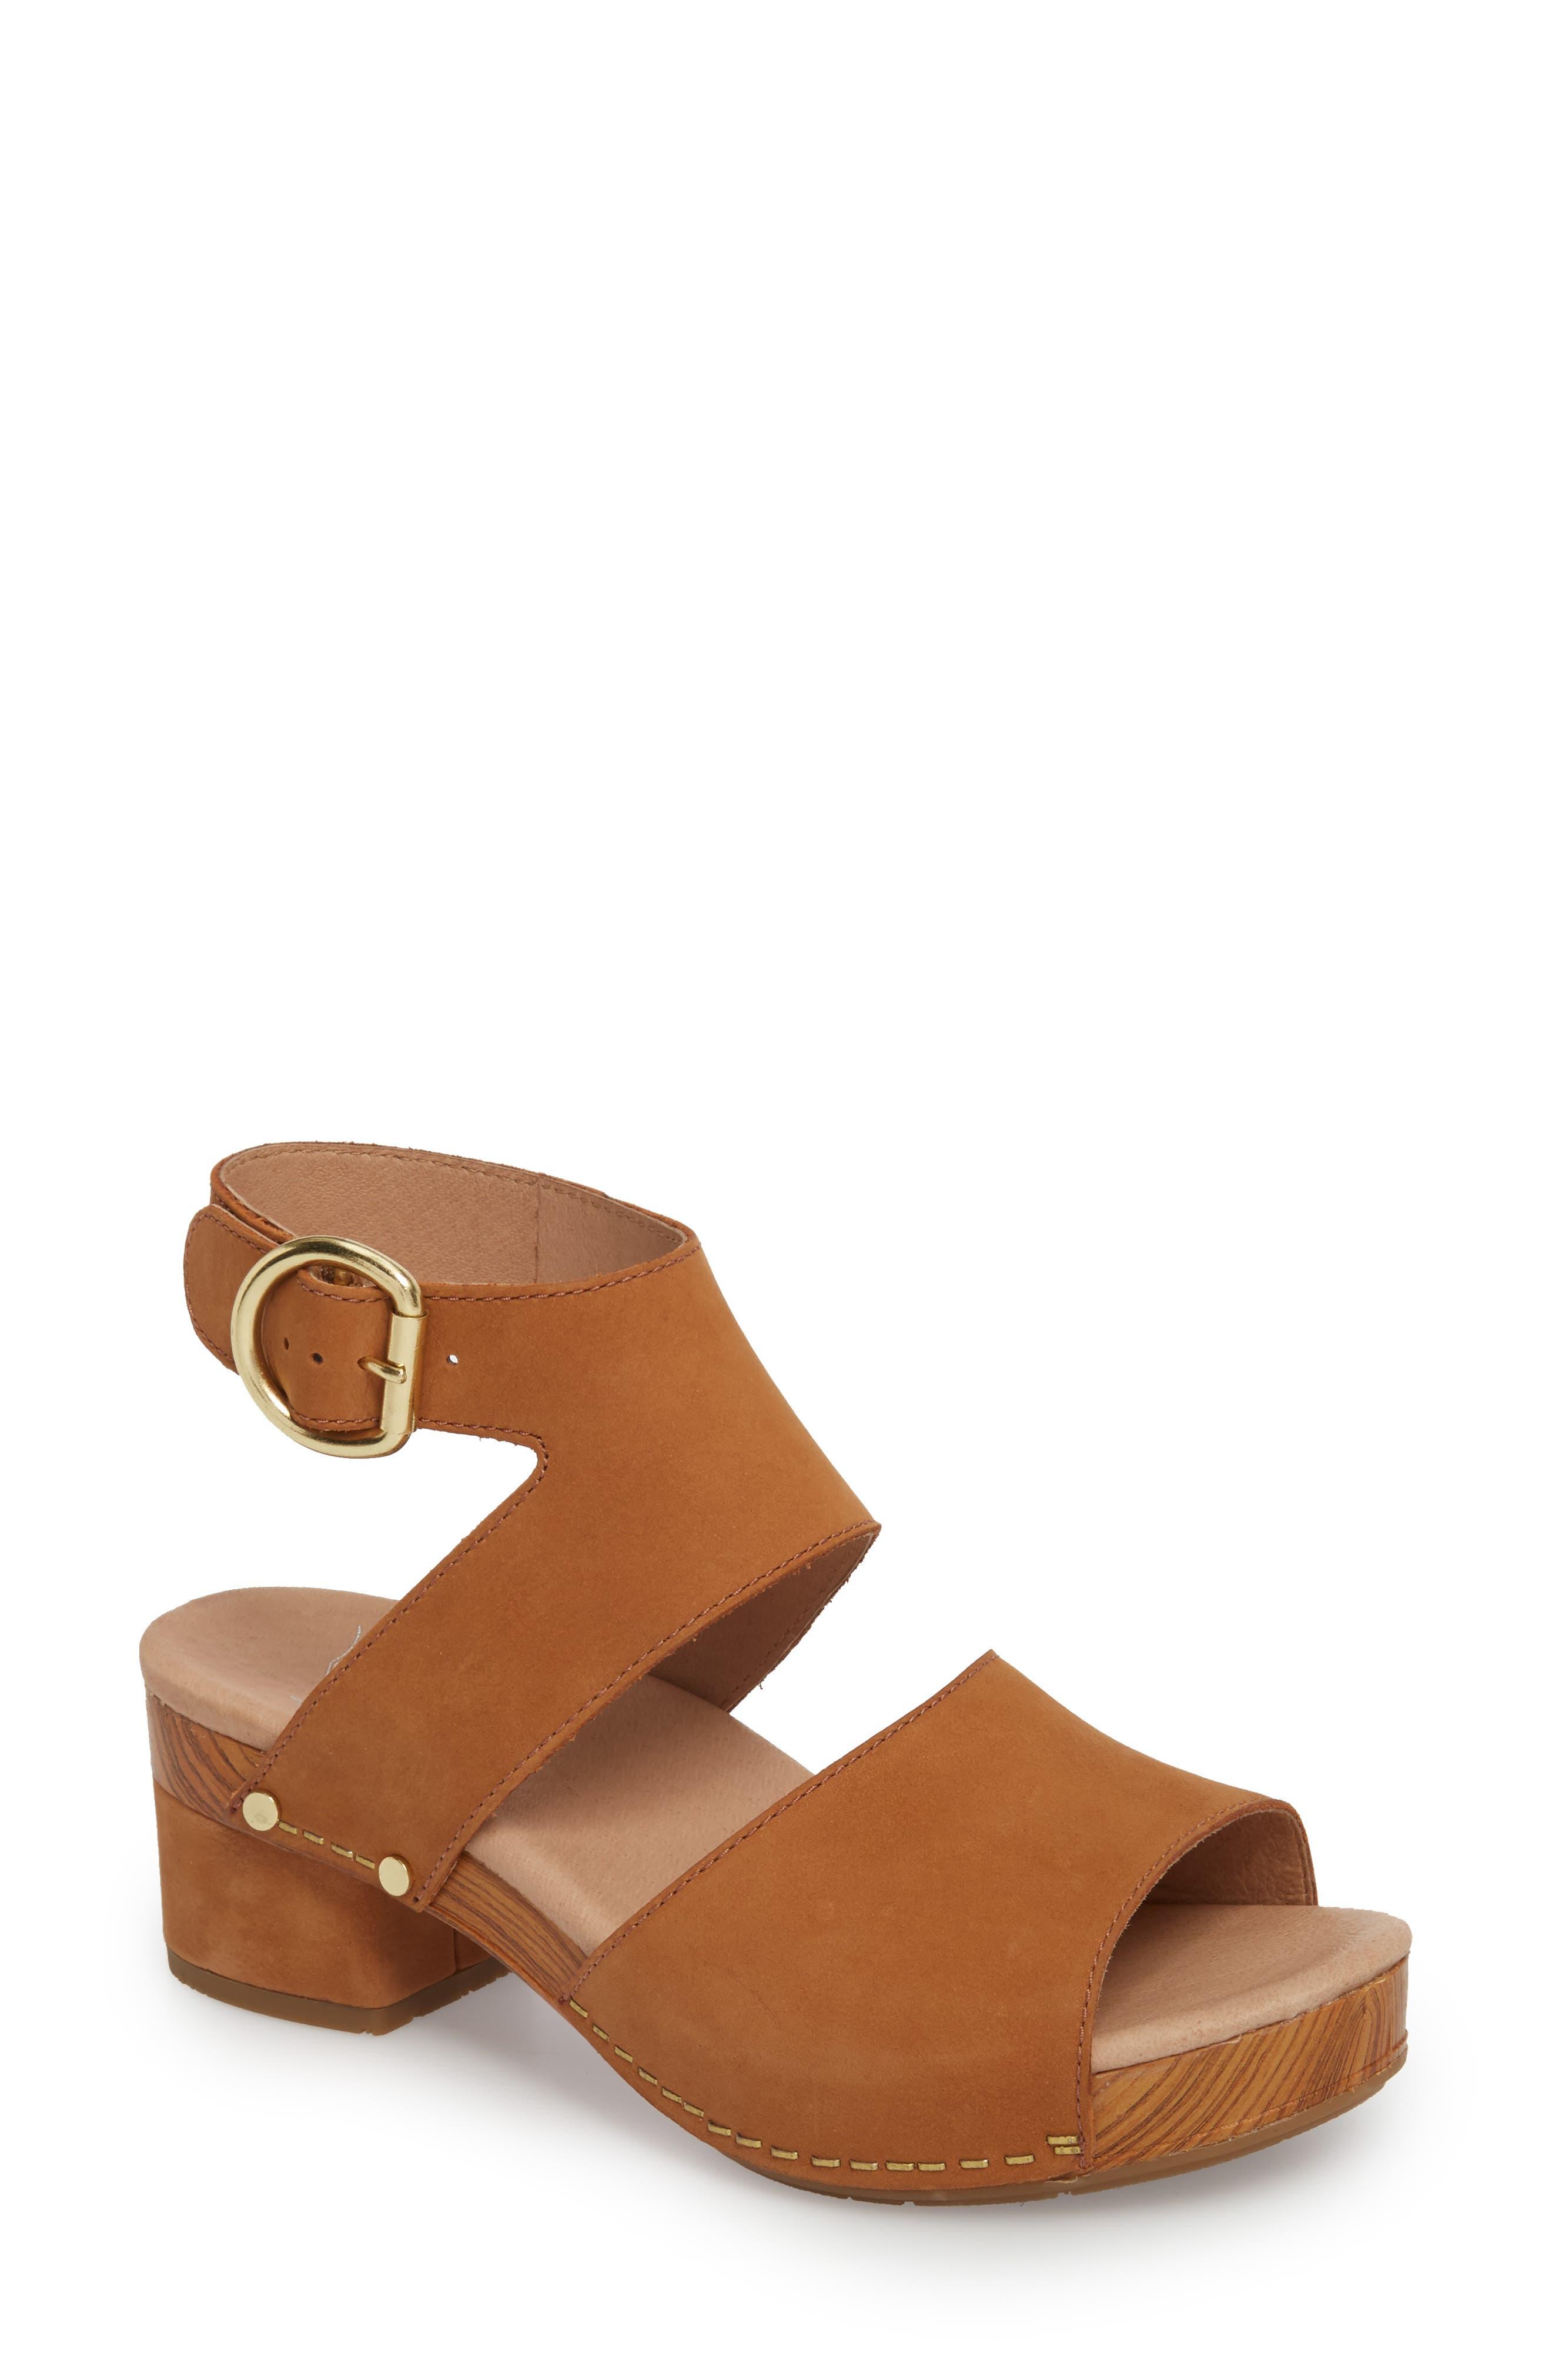 Minka Sandal,                             Main thumbnail 1, color,                             Camel Milled Nubuck Leather